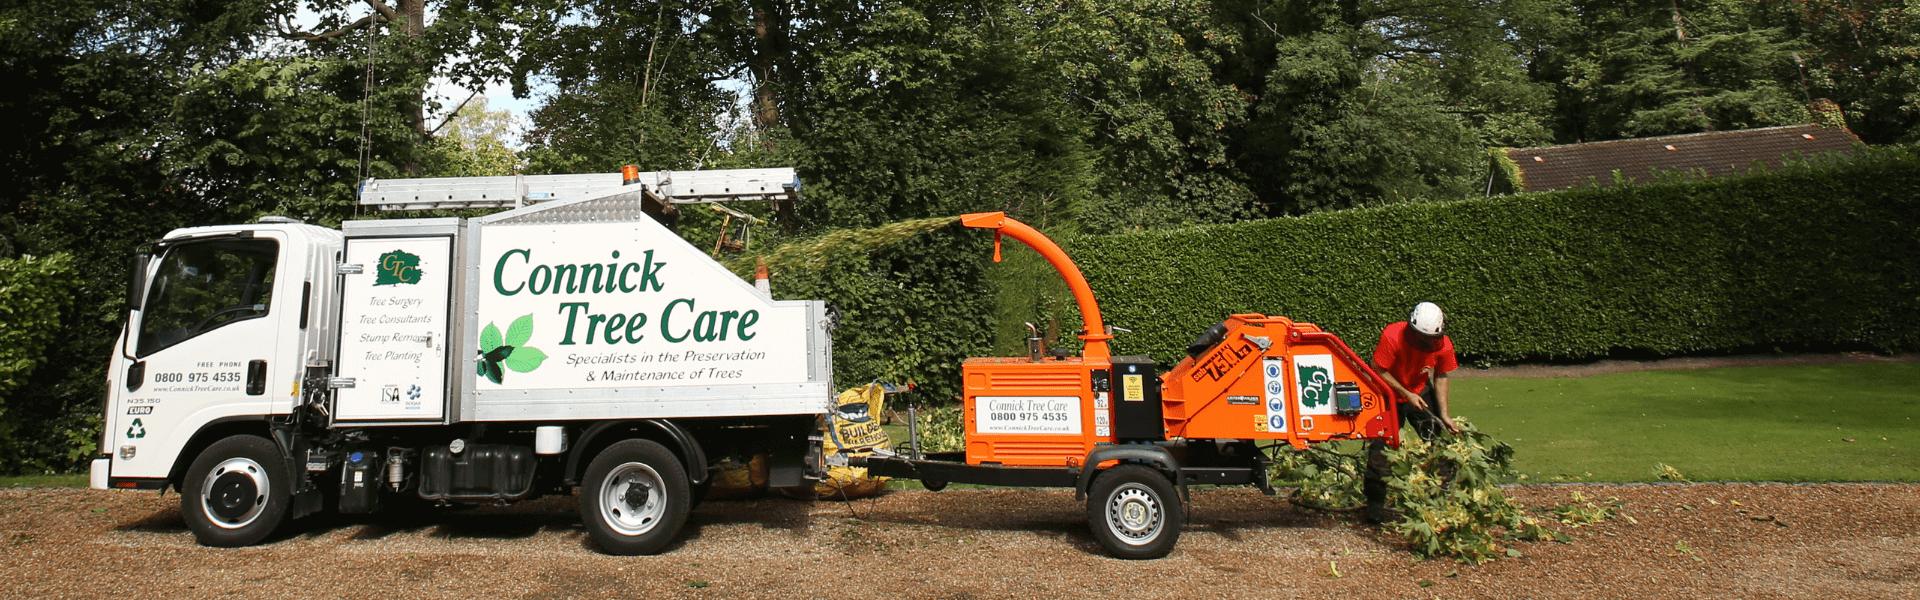 Tree surgeon in Sussex